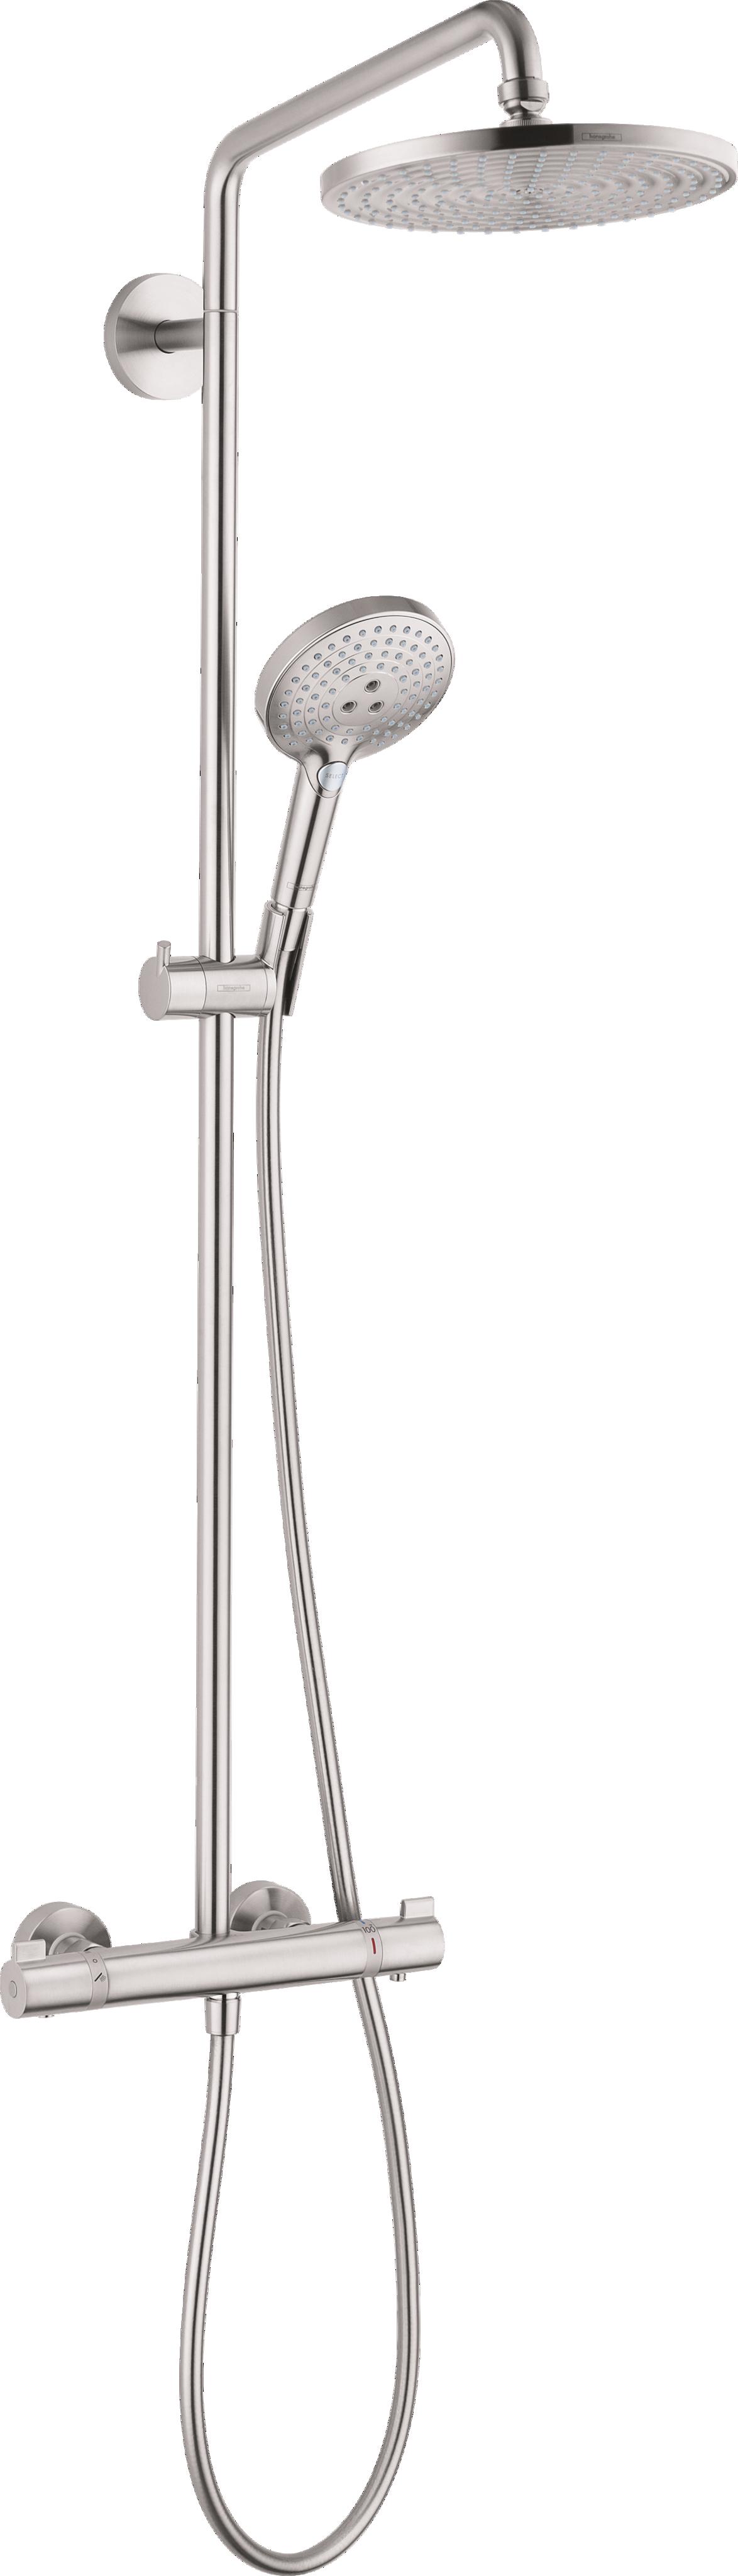 Showerpipe 240 1 Jet, 2.5 GPM